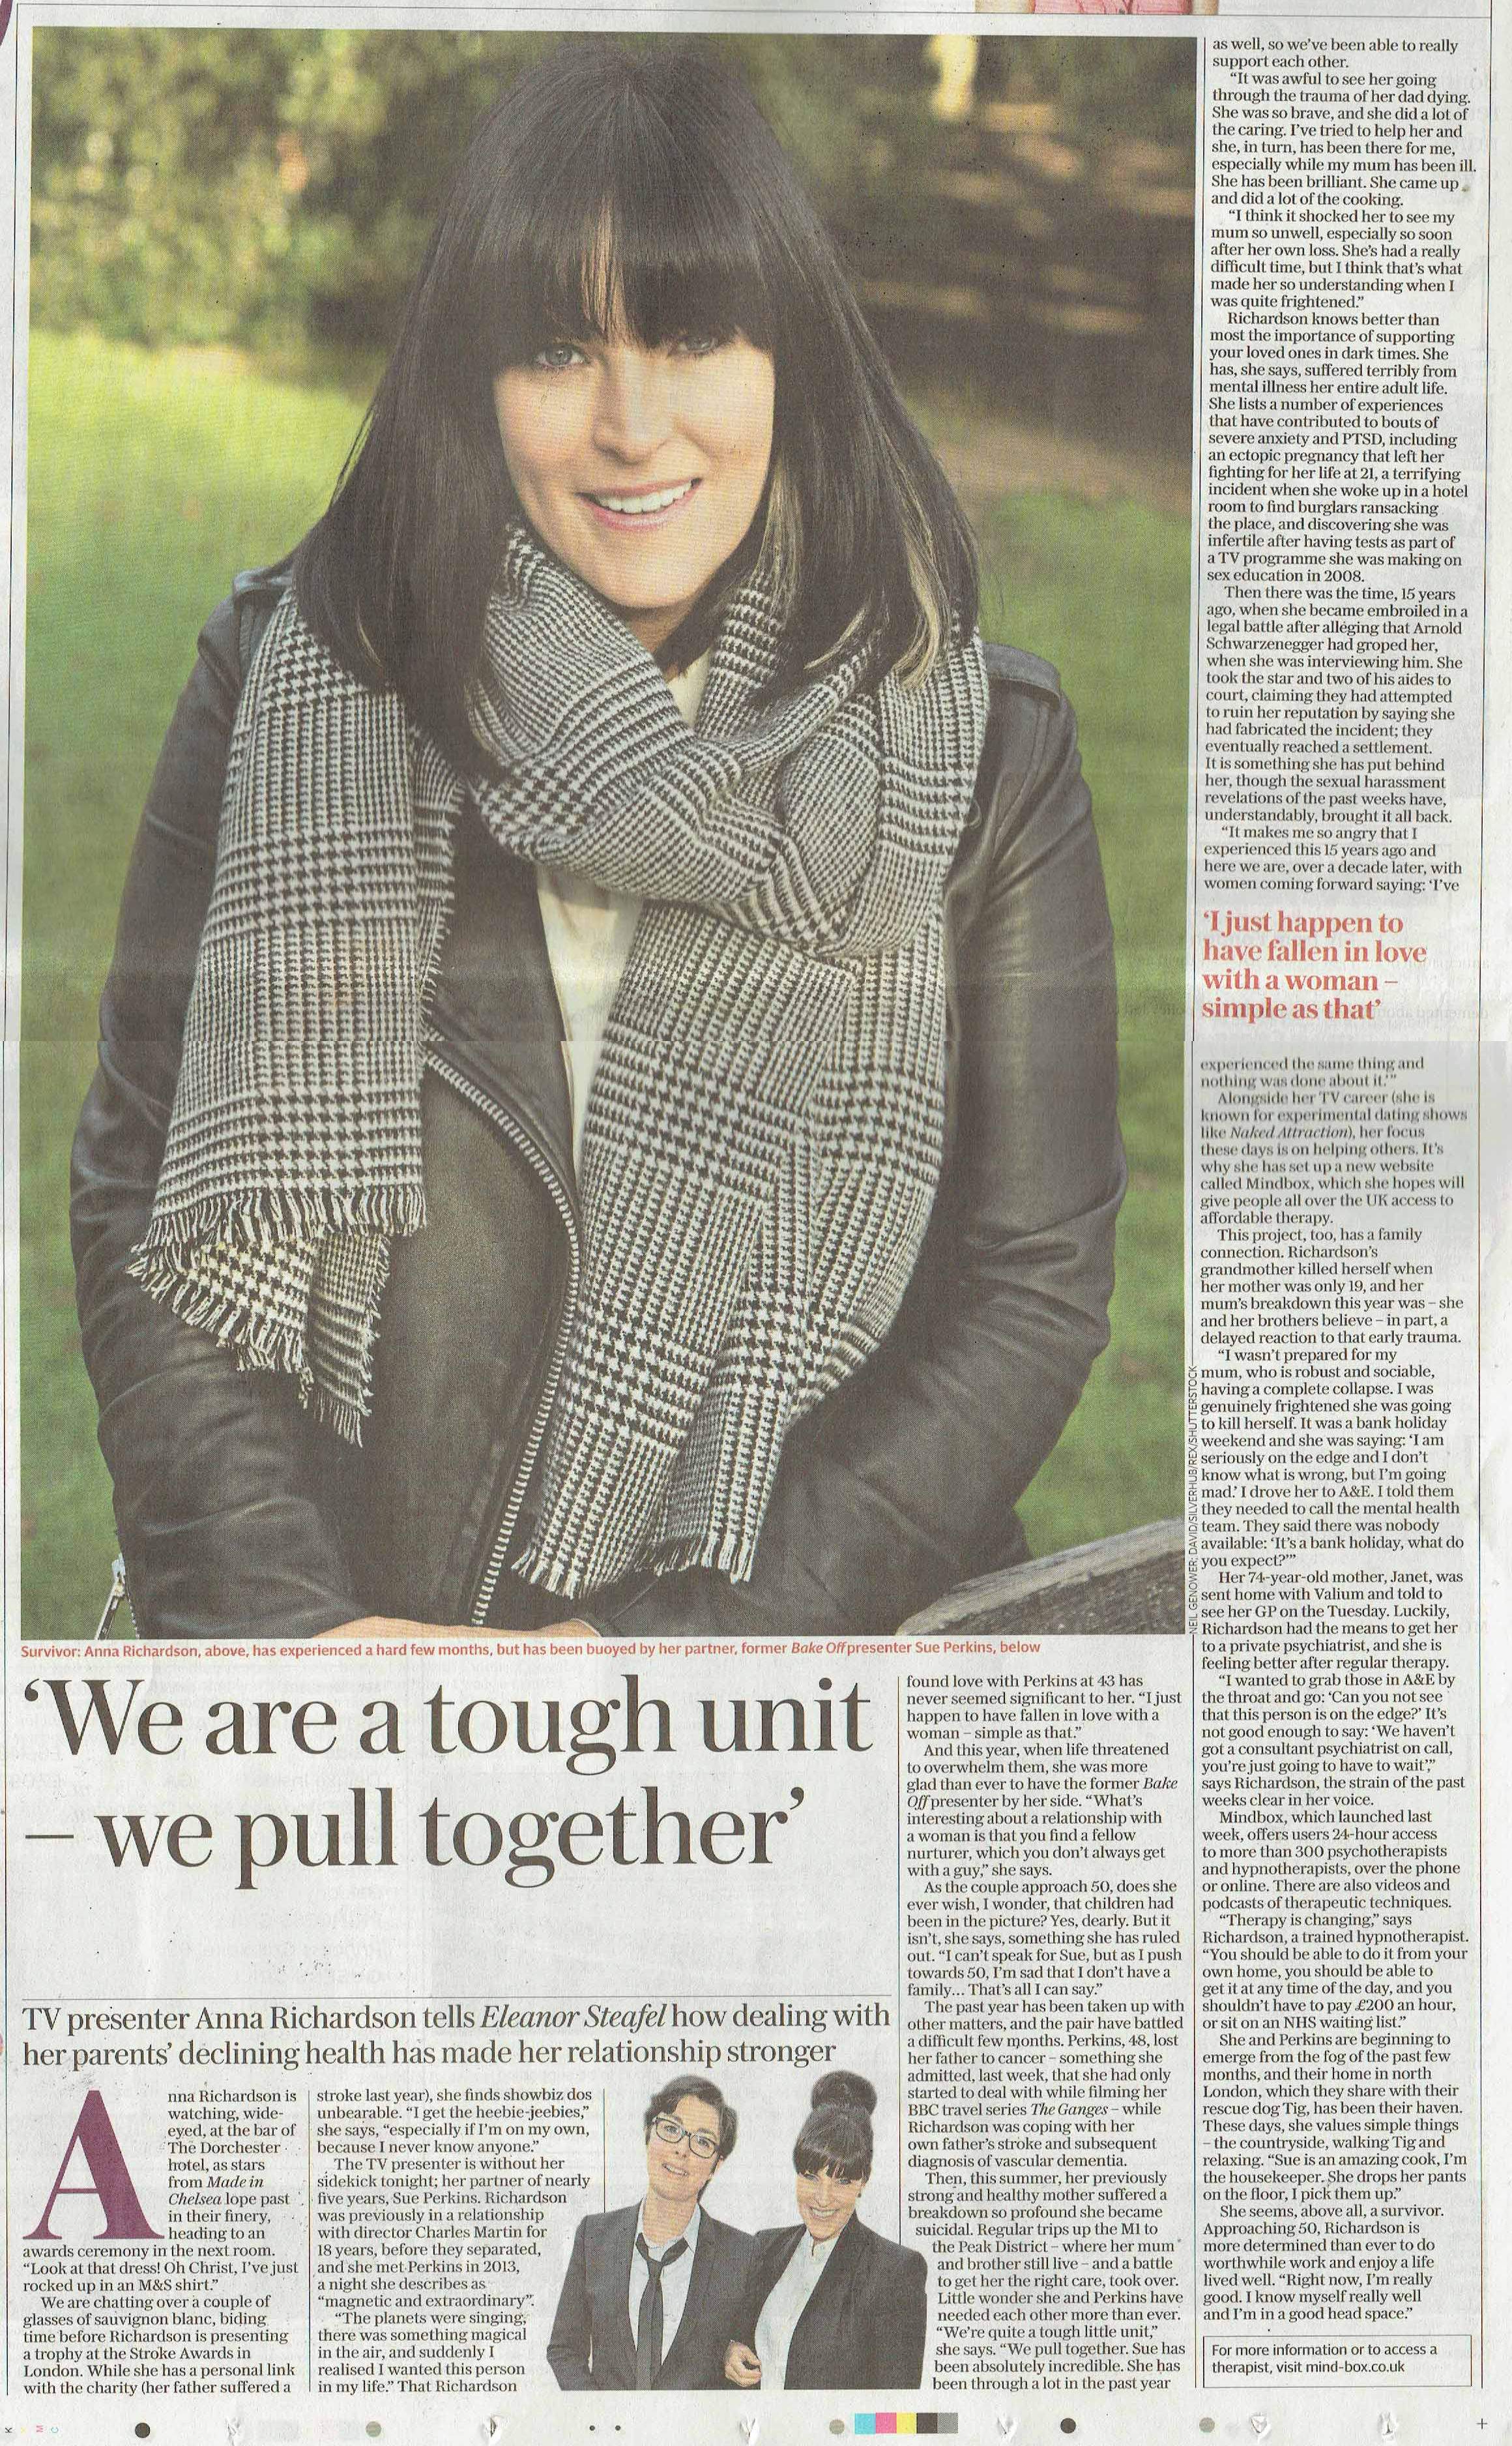 The Sunday Telegraph, Mindbox, Anna Richardson feature, 5th November